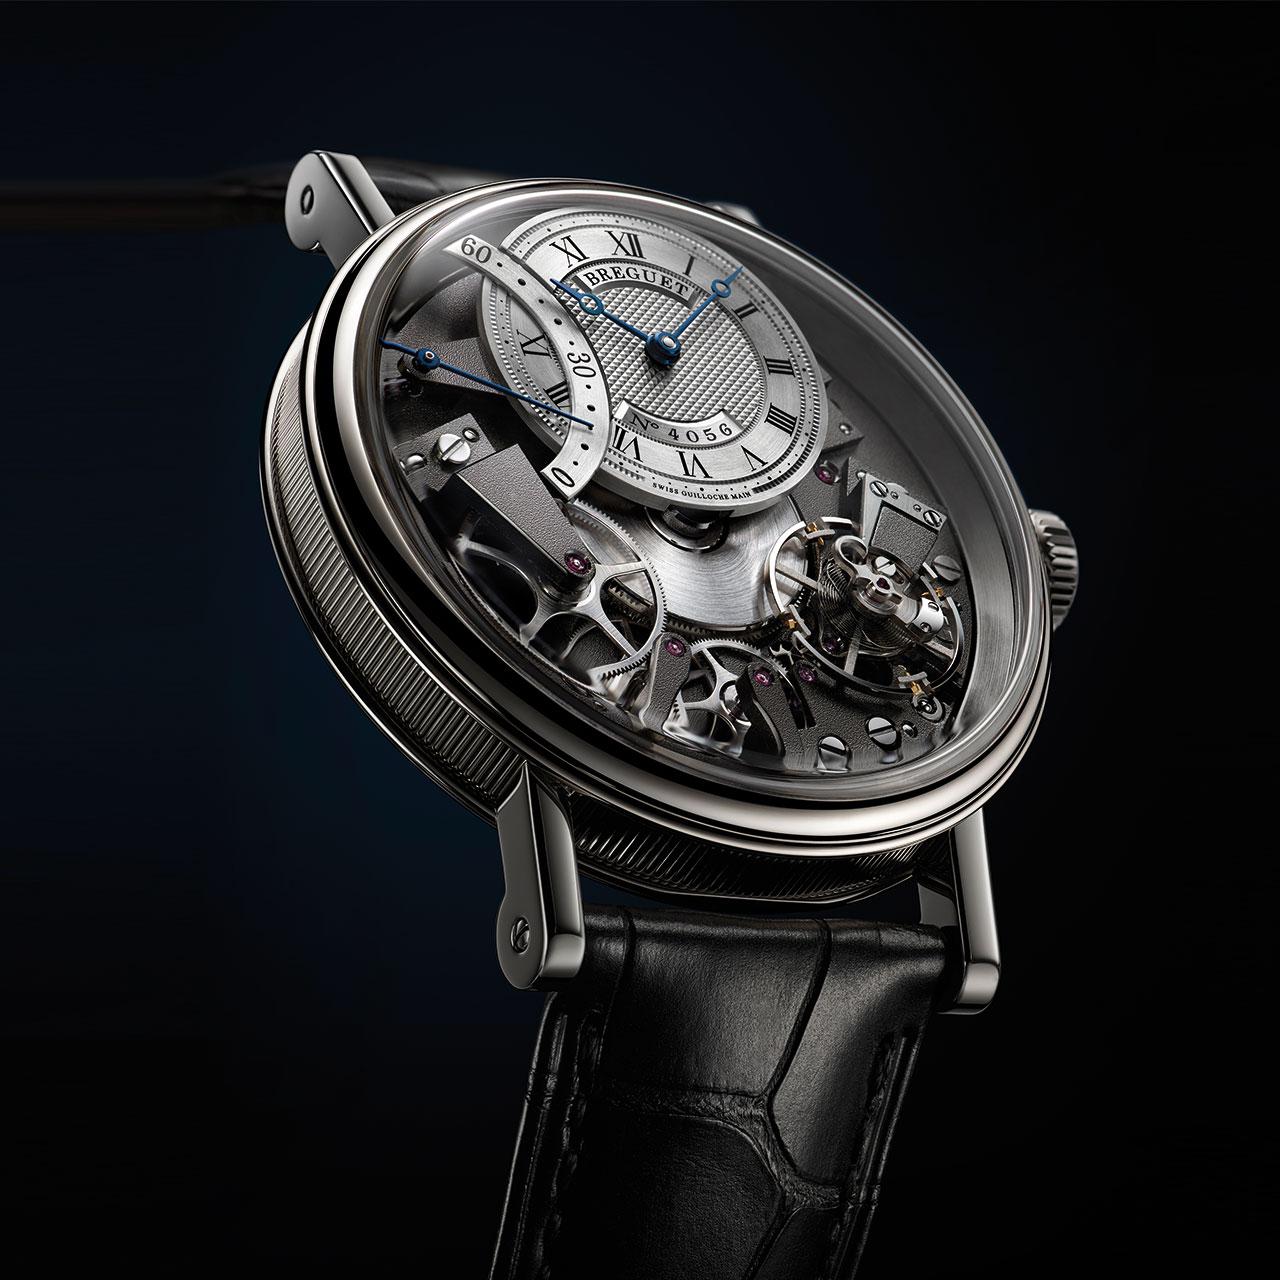 Breguet Tradition Automatique Seconde Rétrograde 7097 Watch